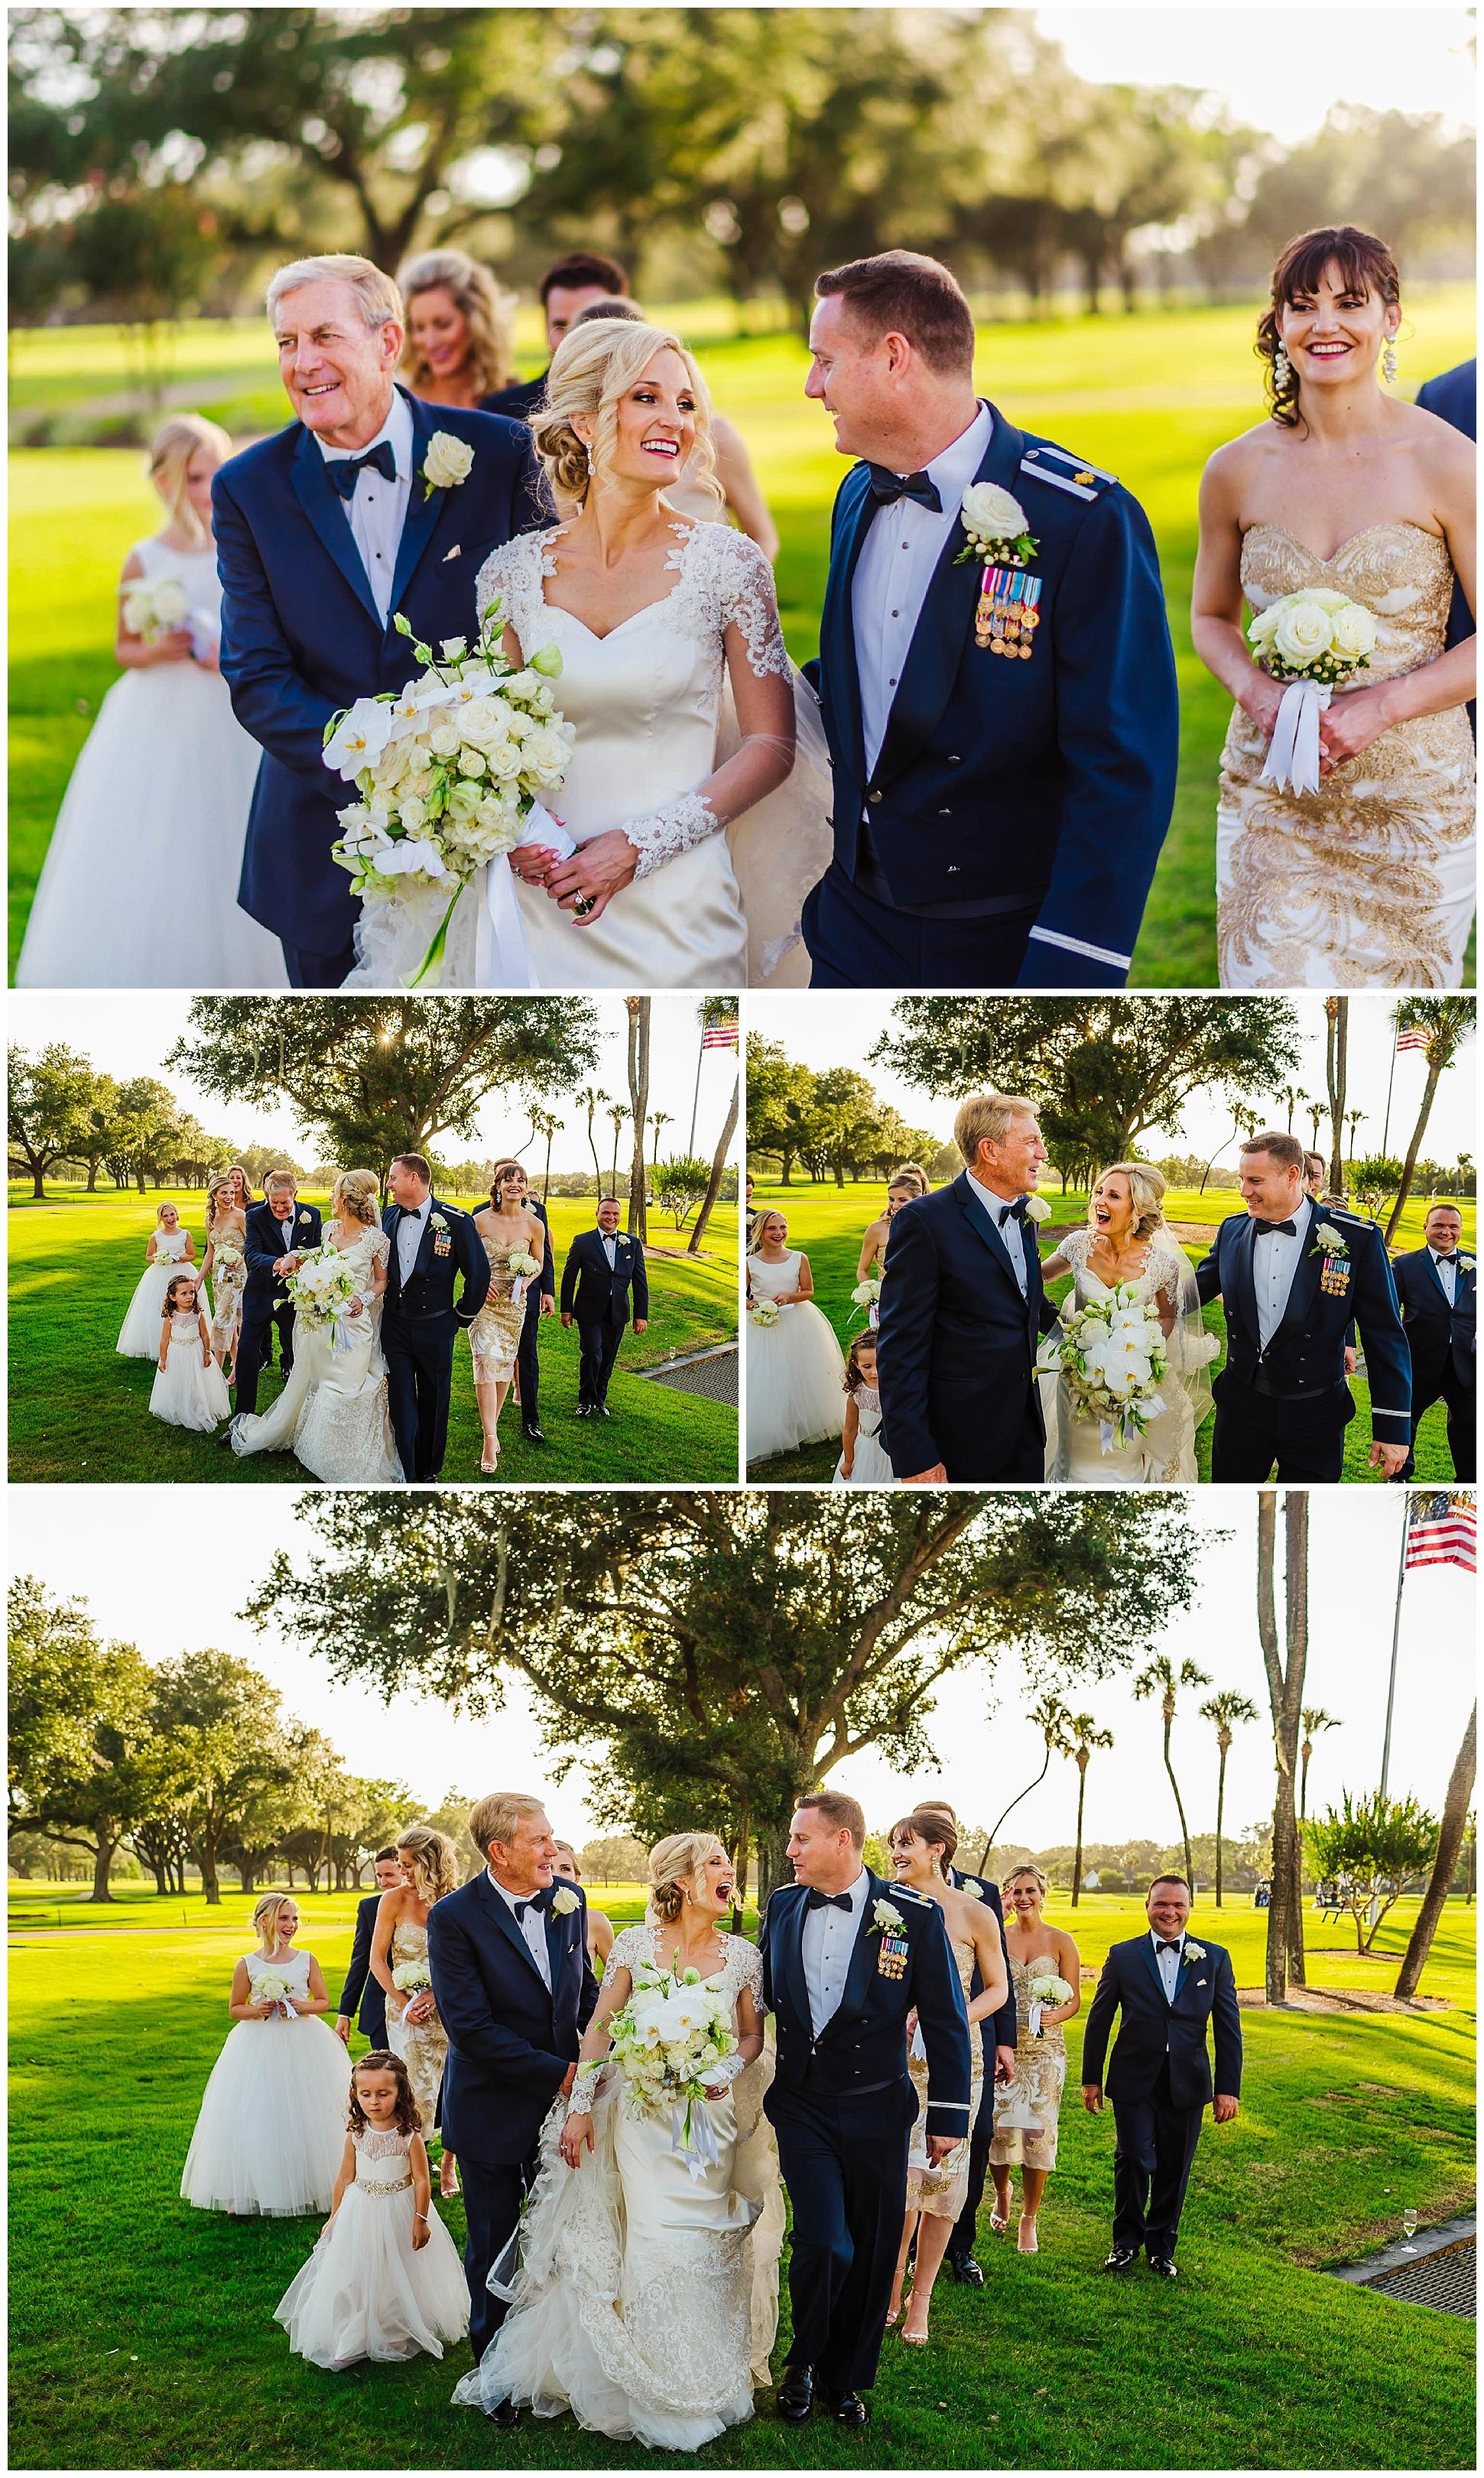 tampa-wedding-photographer-sleeves-palma-ceia-country-club-golf-course-sunset-luxury_0077.jpg